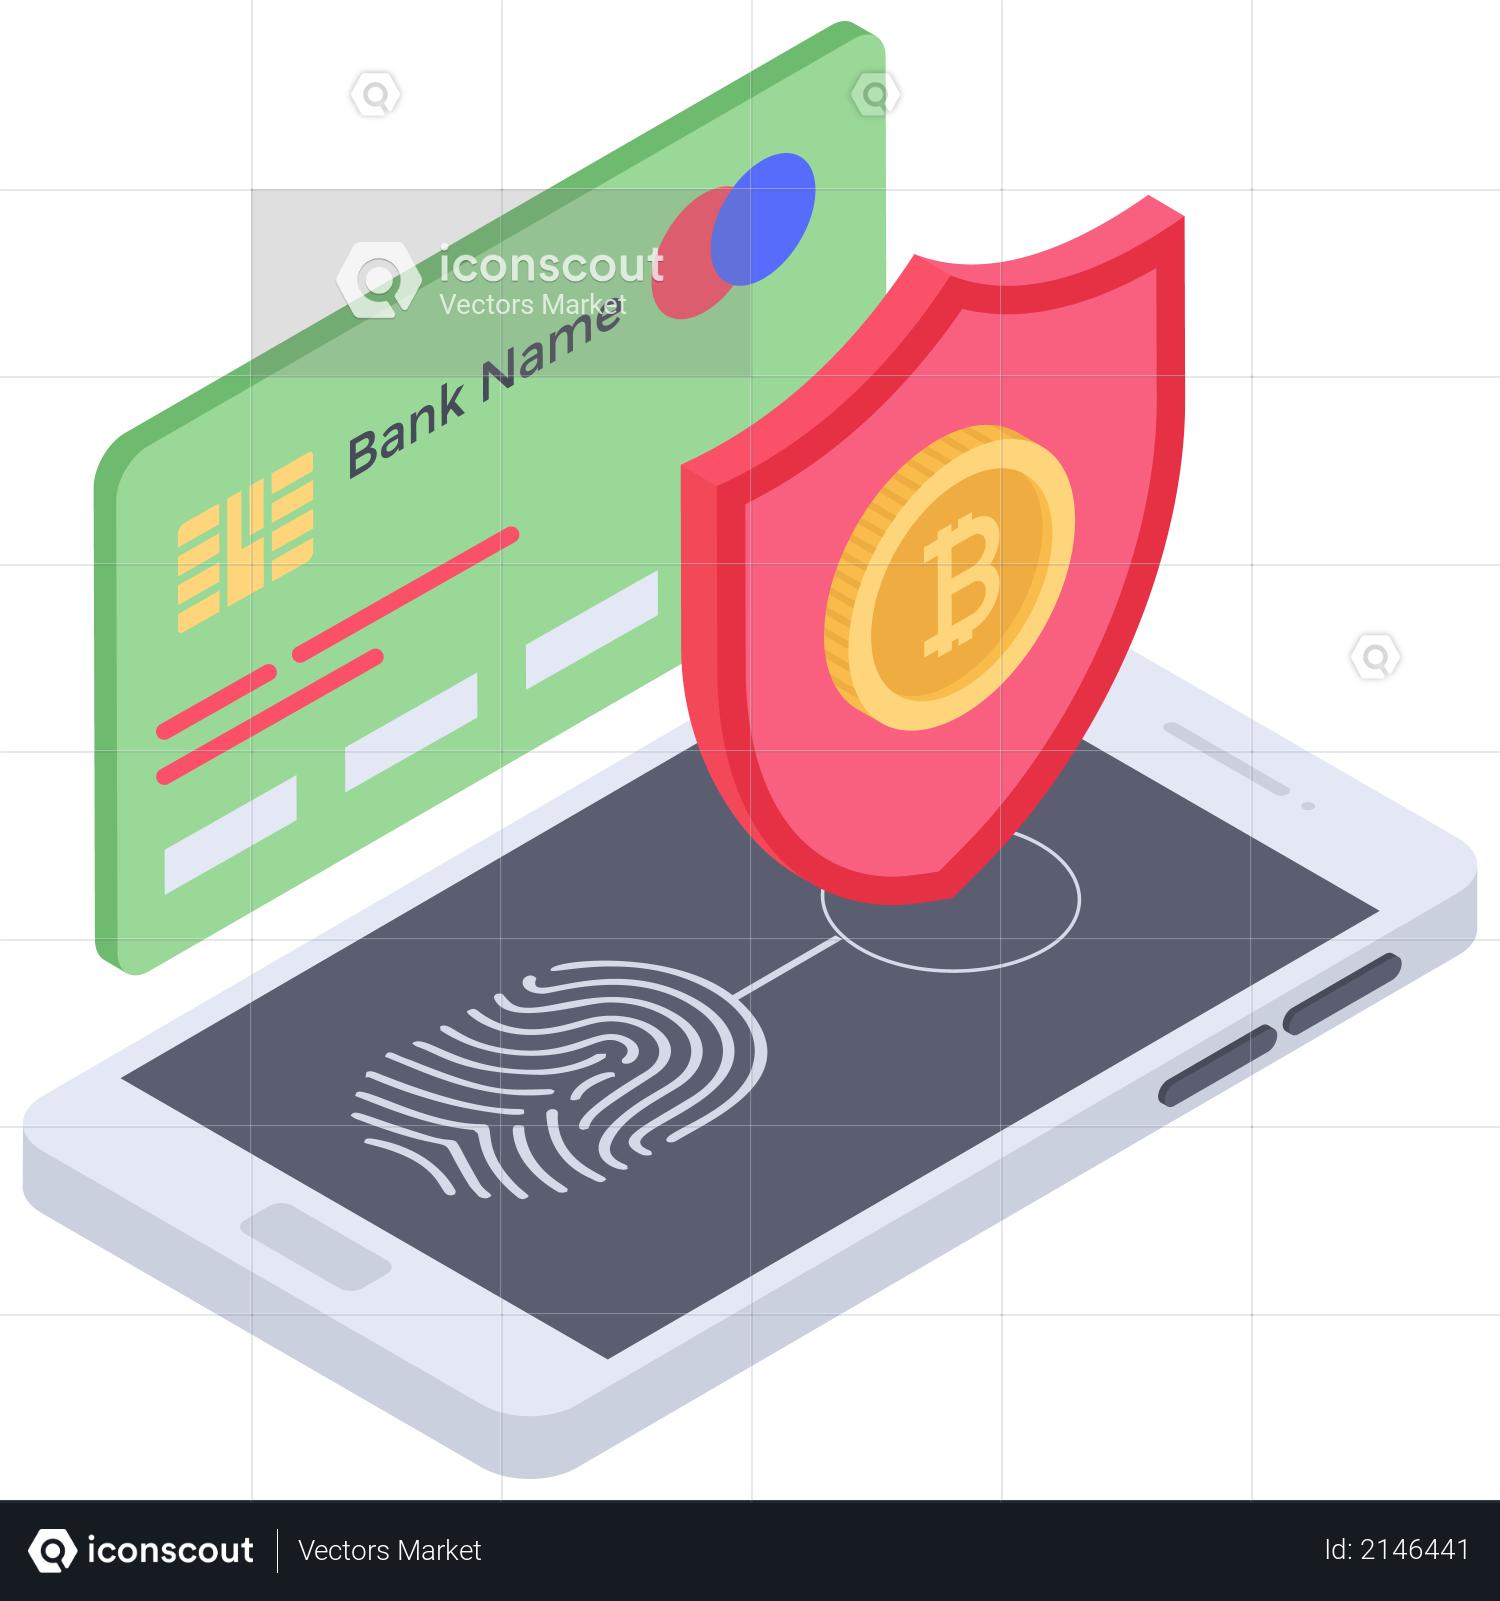 Bitcoin Card payment security Illustration